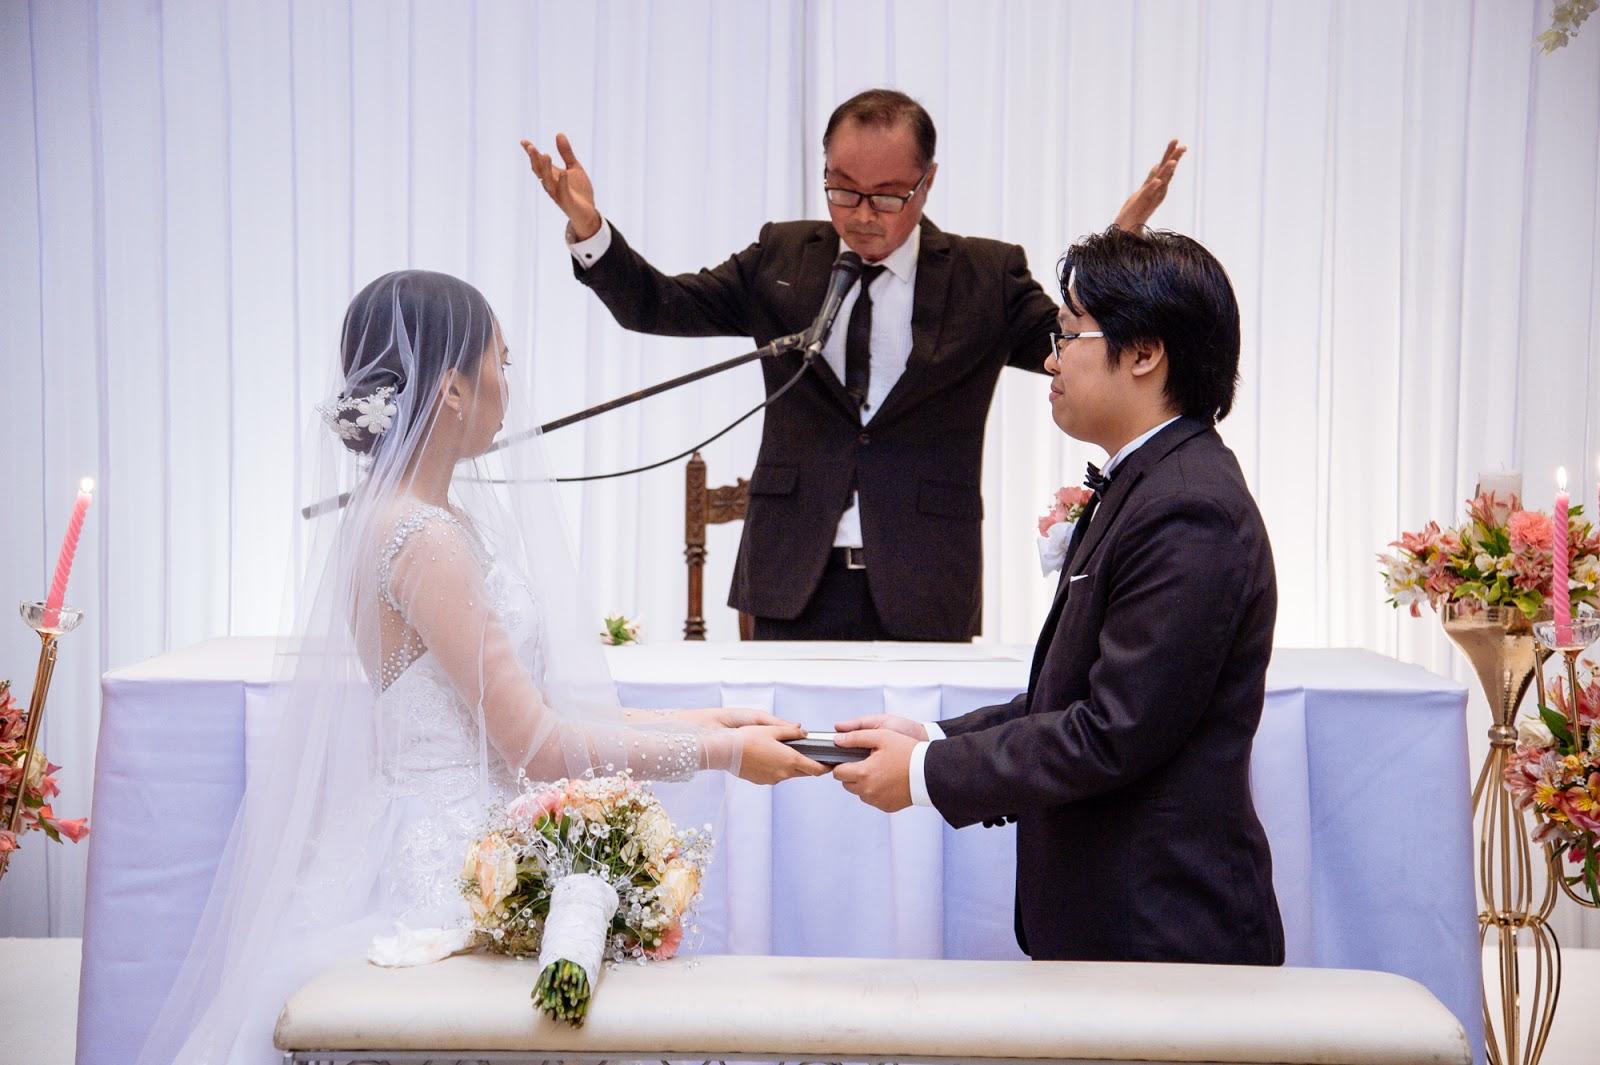 Our dream wedding